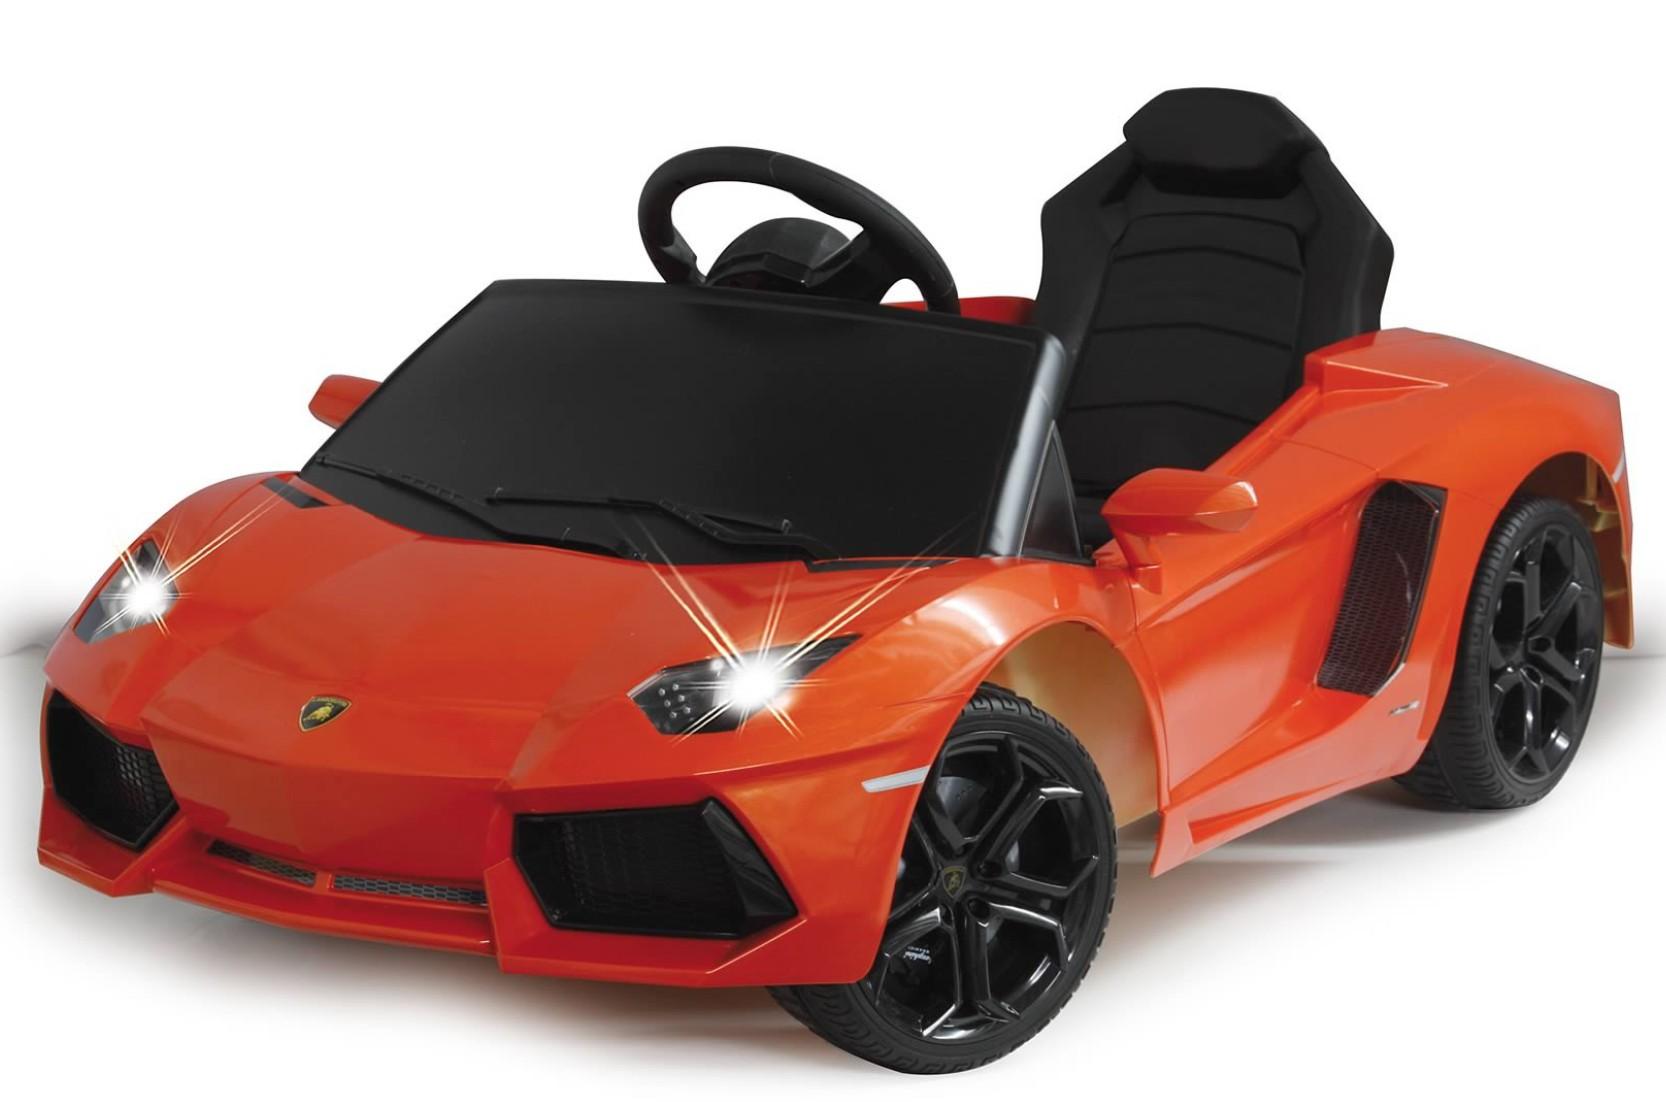 voiture lectrique lamborghini aventador orange 2x25w 12v. Black Bedroom Furniture Sets. Home Design Ideas